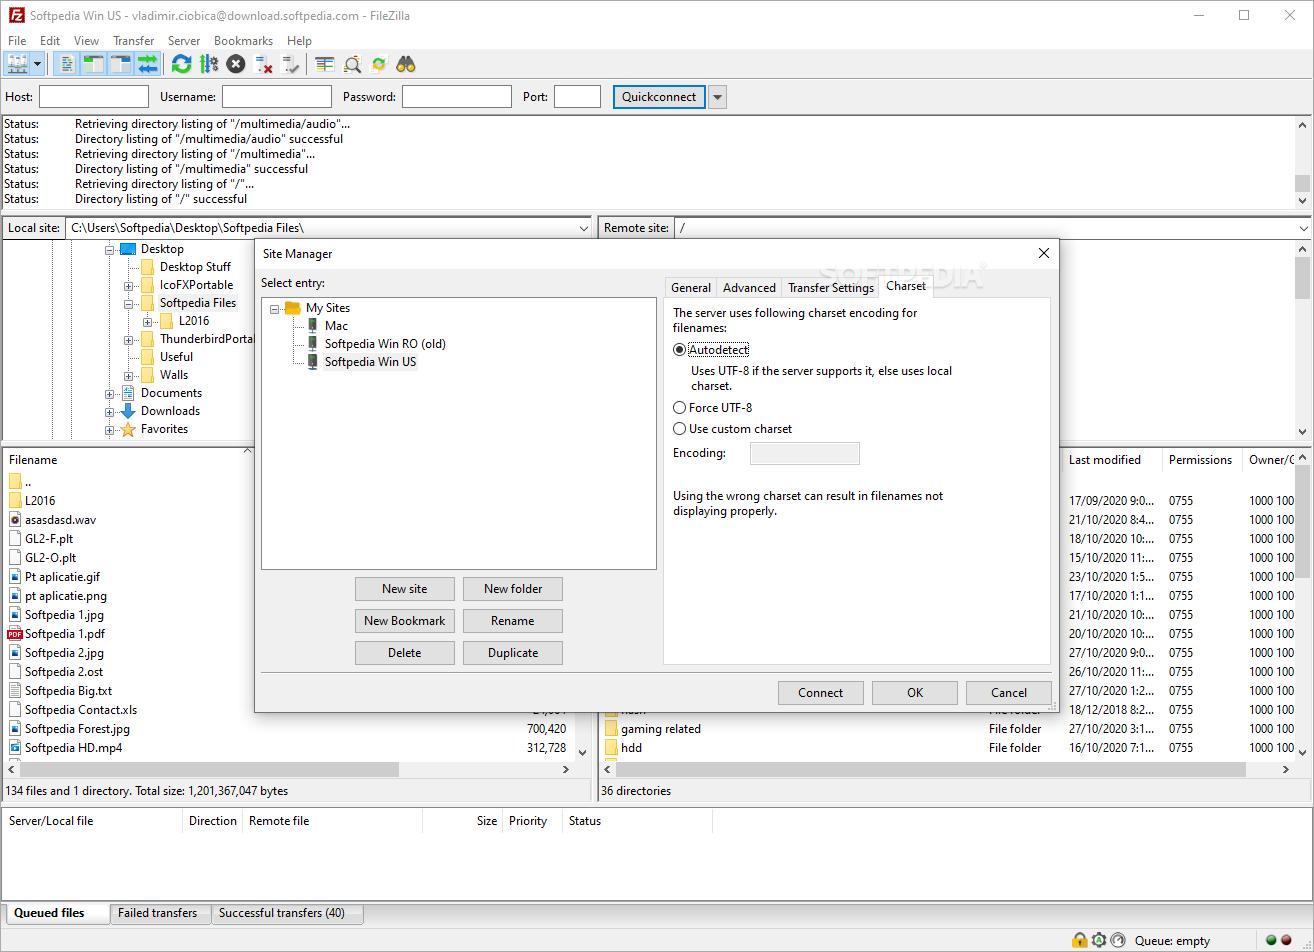 Filezilla 3.51.0 download